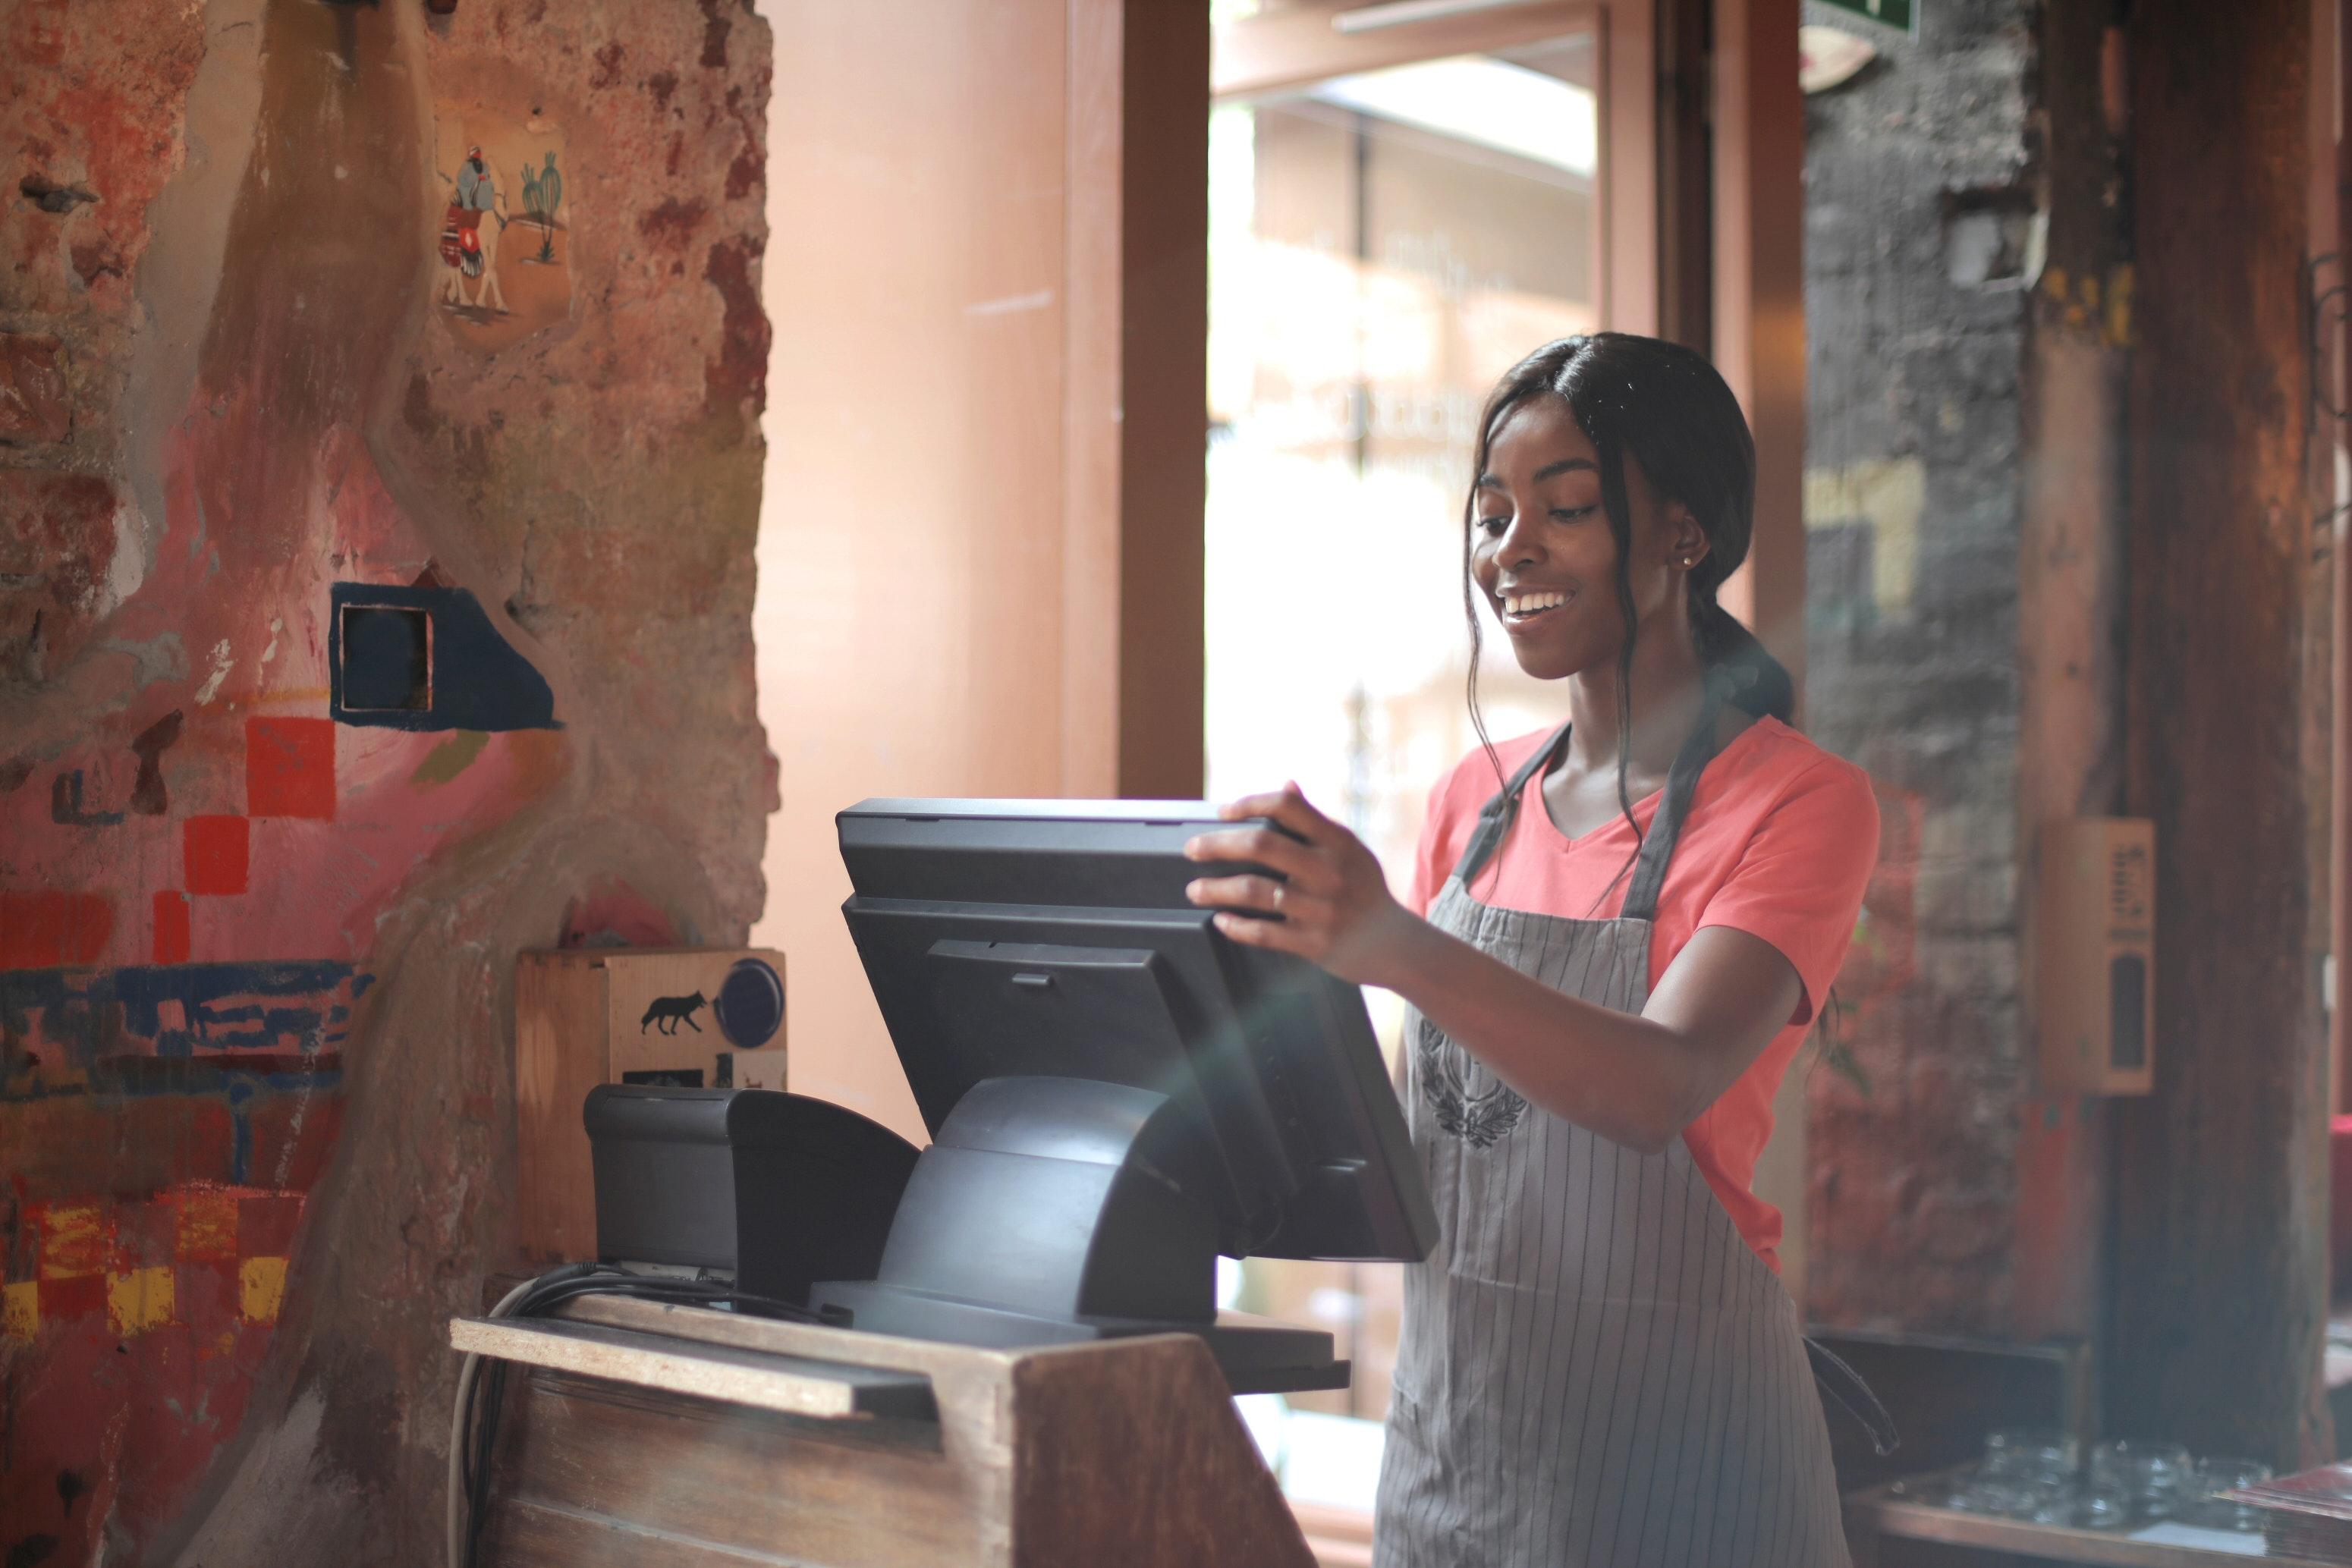 Restaurant server technology systems